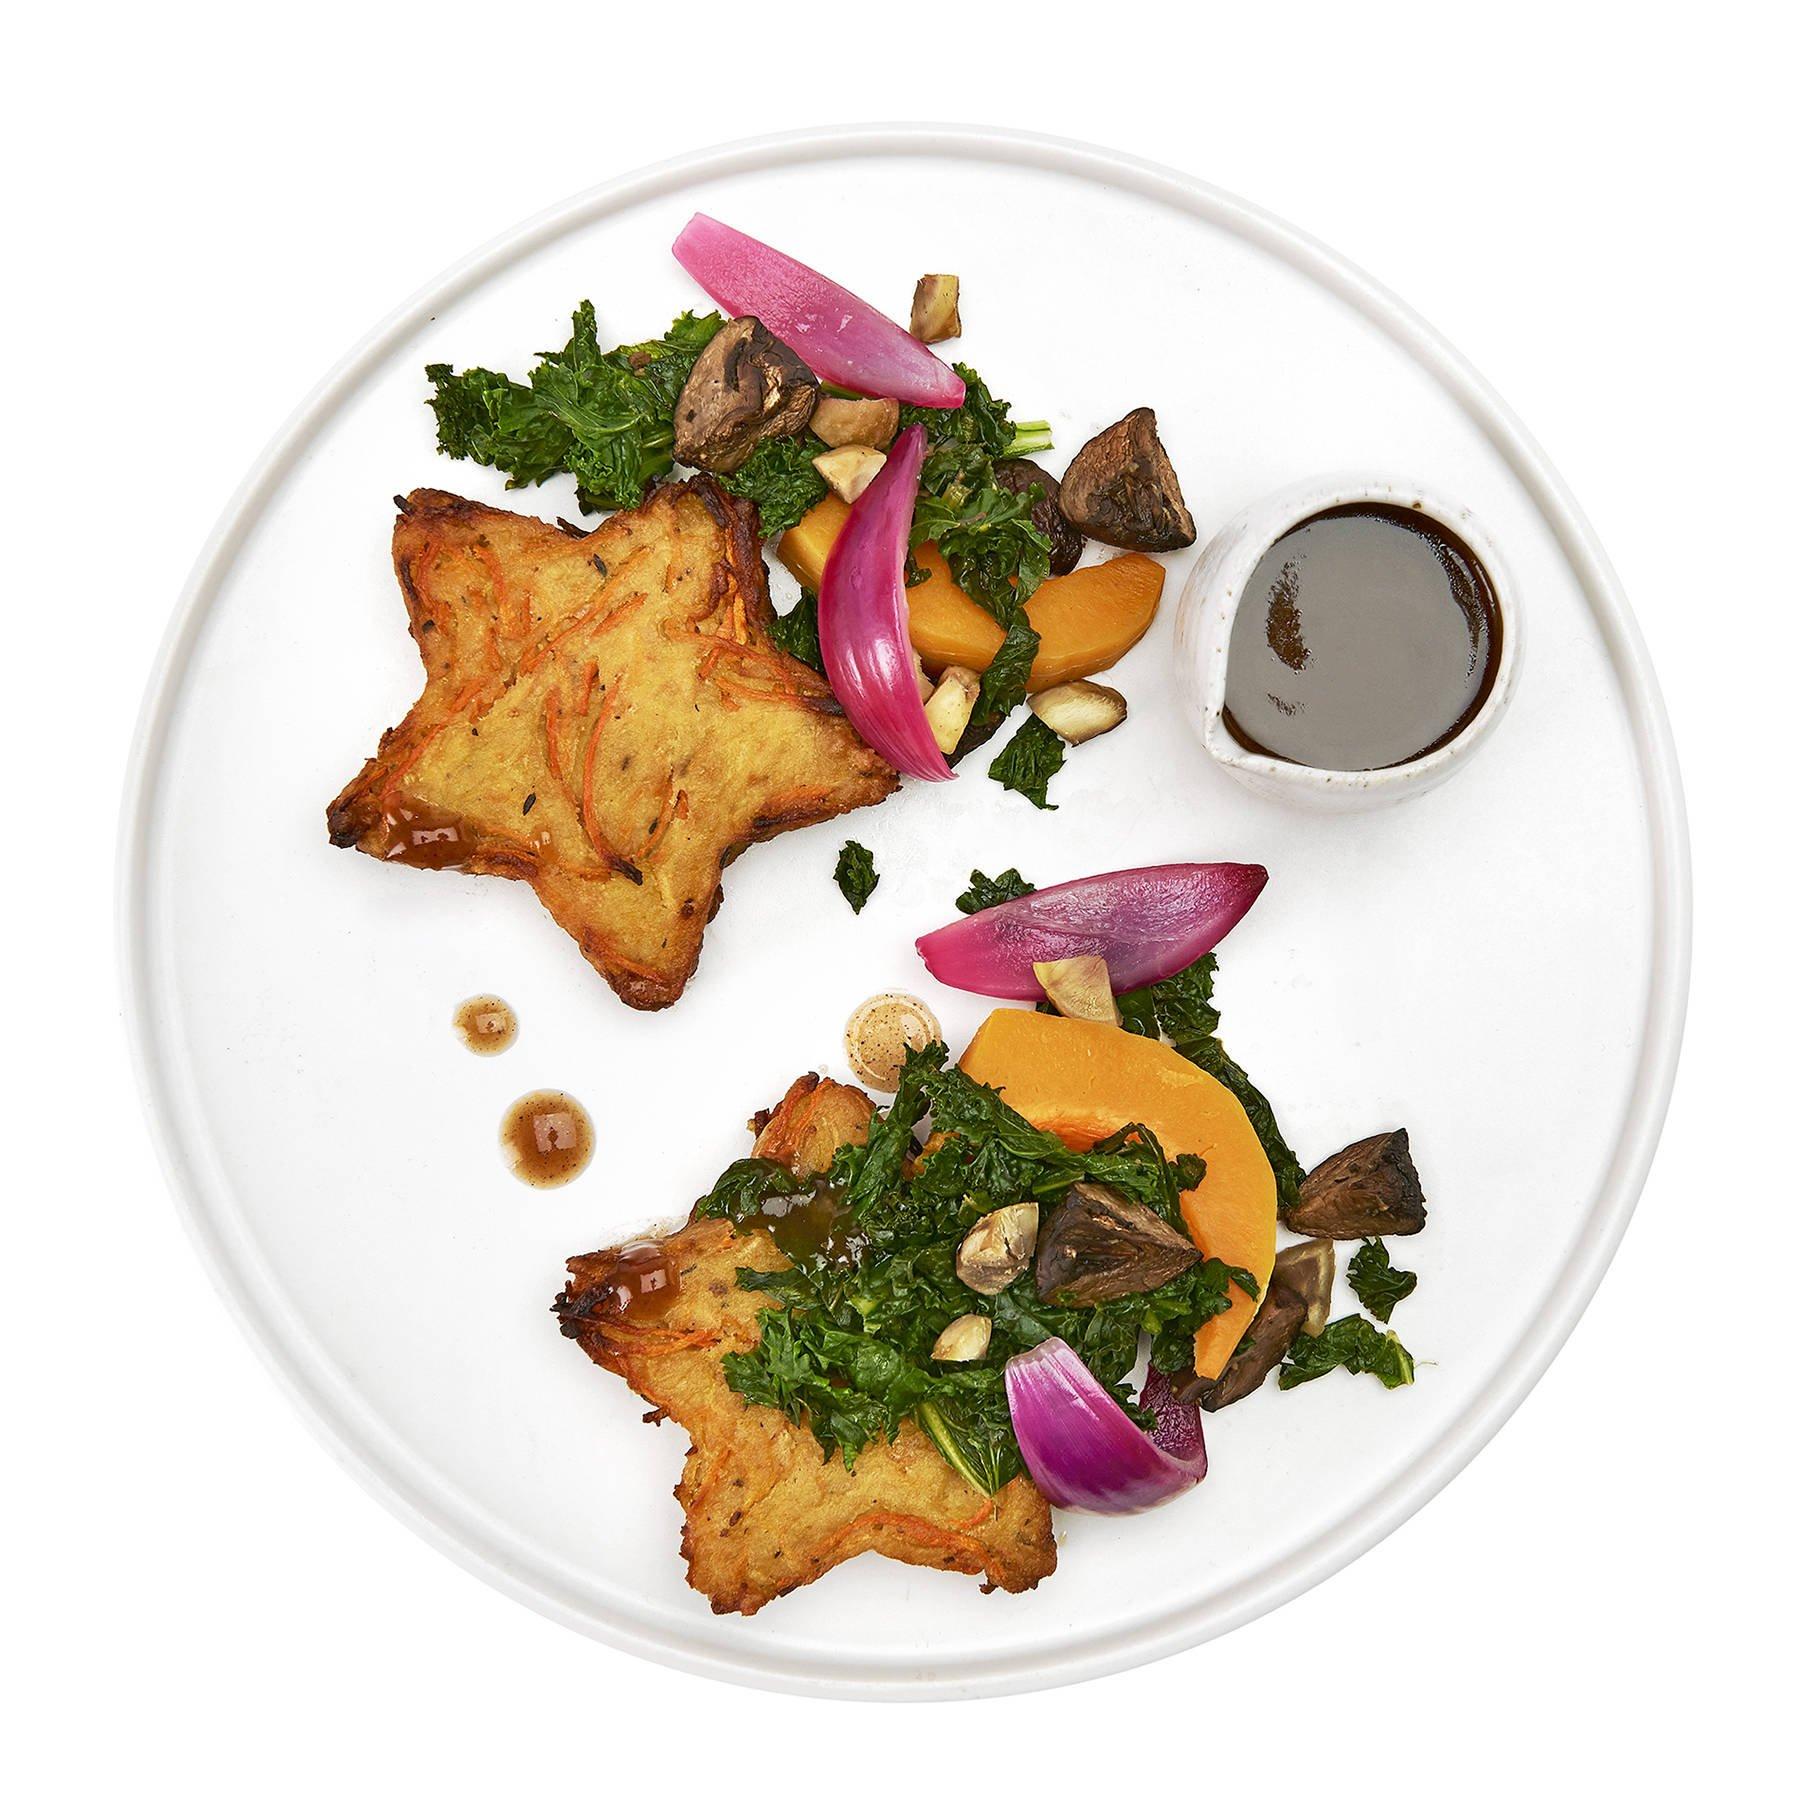 Rosti Pack -- Waitrose Vegan & Vegetarian Festive Food